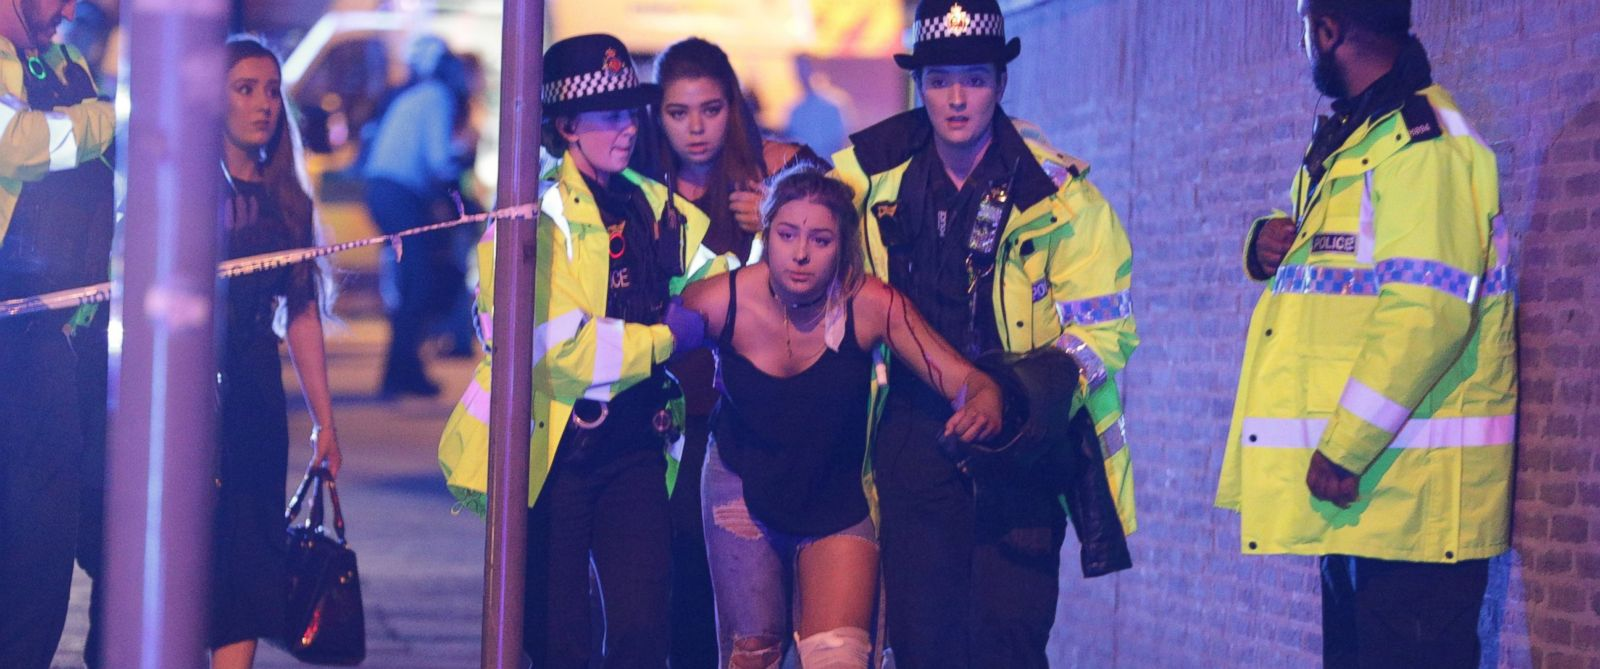 atac terorist manchester 23.05